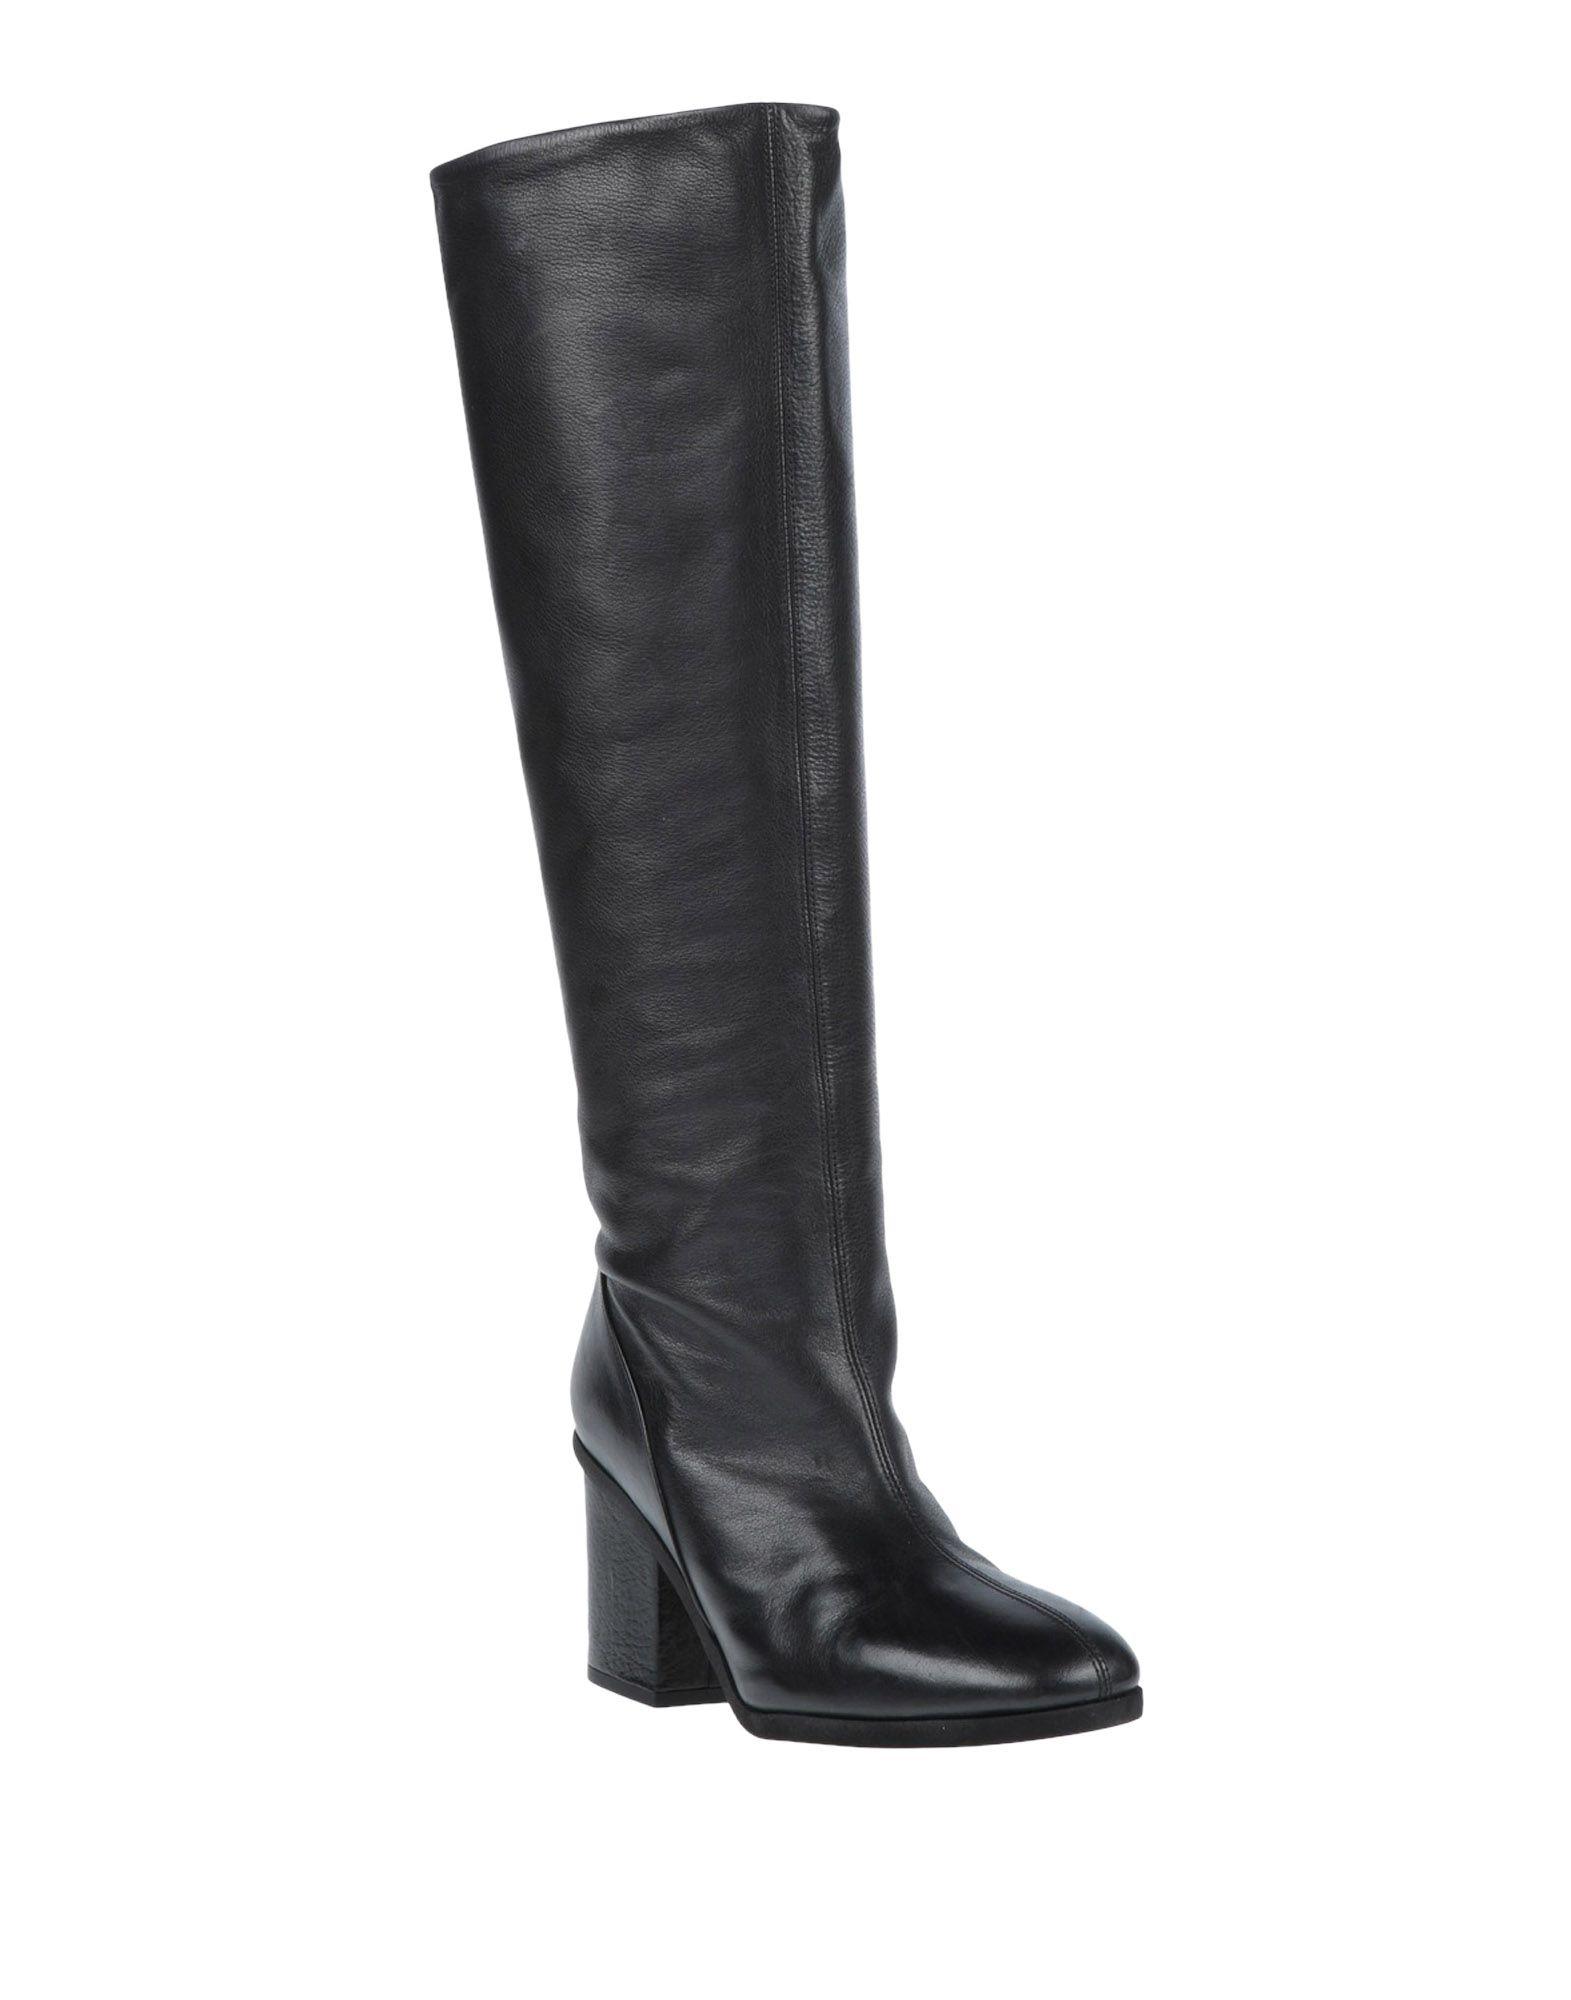 Stilvolle billige 11511652SK Schuhe Ottod ame Stiefel Damen 11511652SK billige 099f64